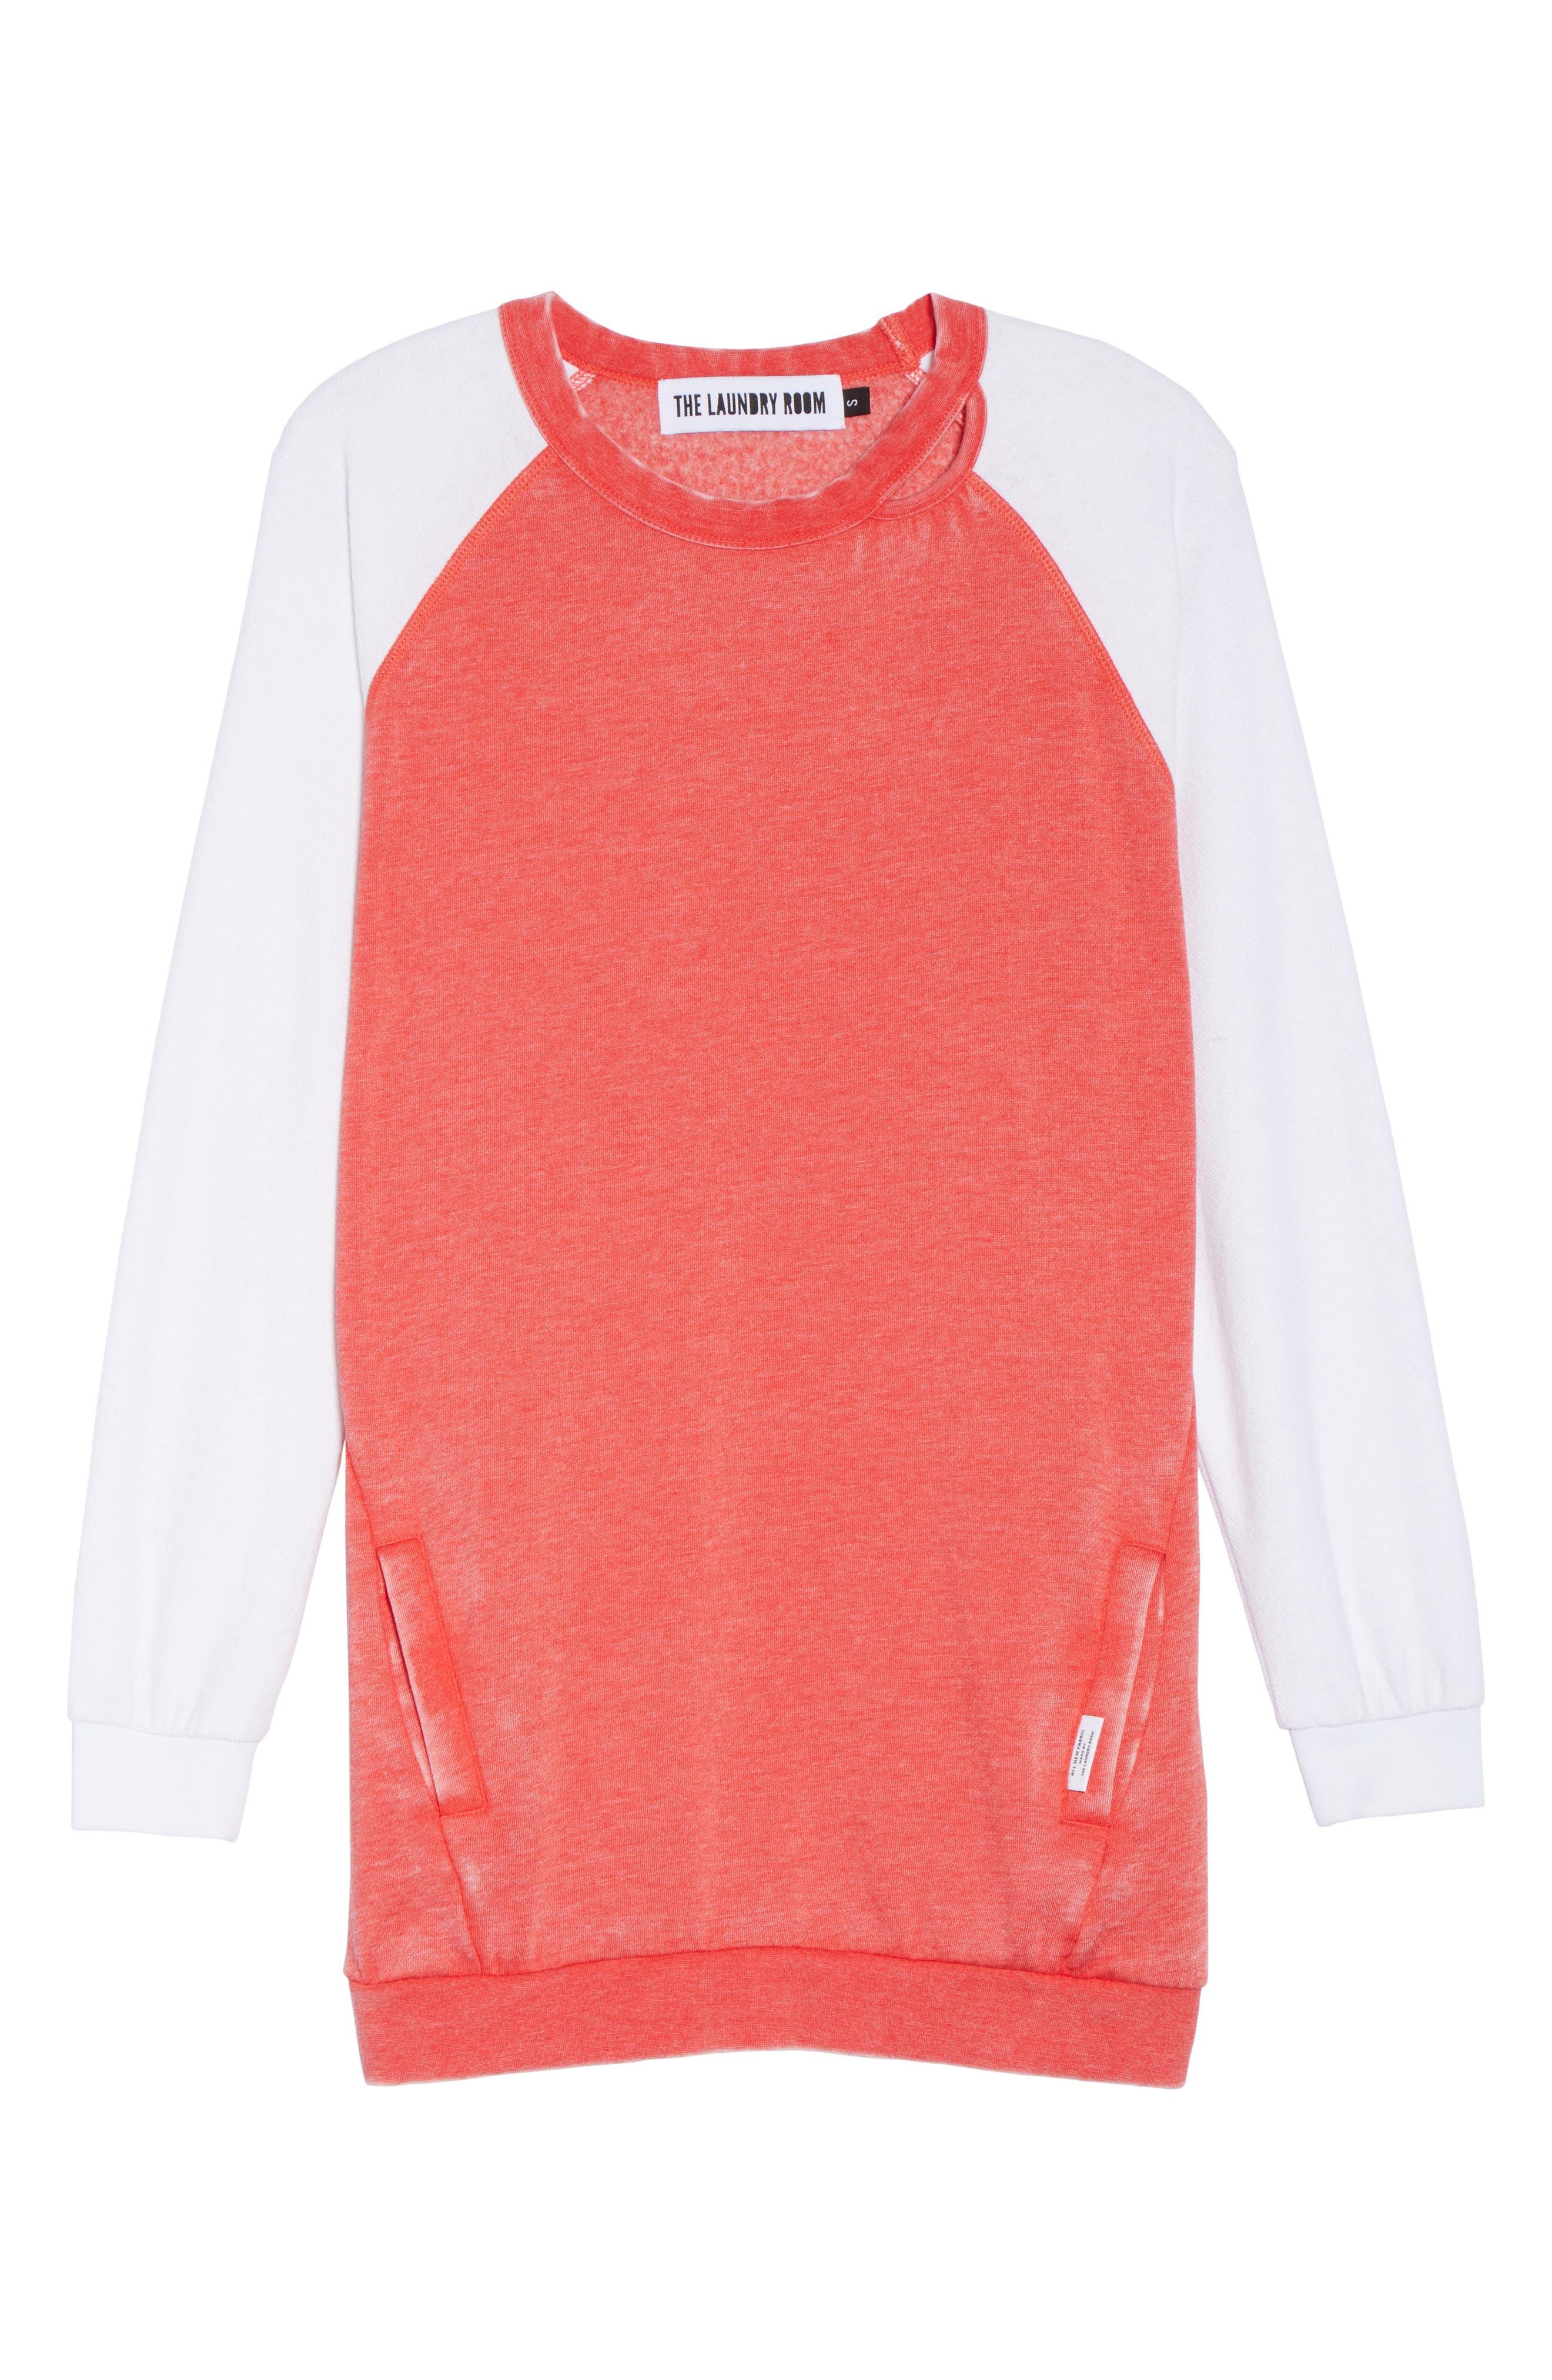 Lounge Sweatshirt Dress,                             Alternate thumbnail 6, color,                             Love Red/ White